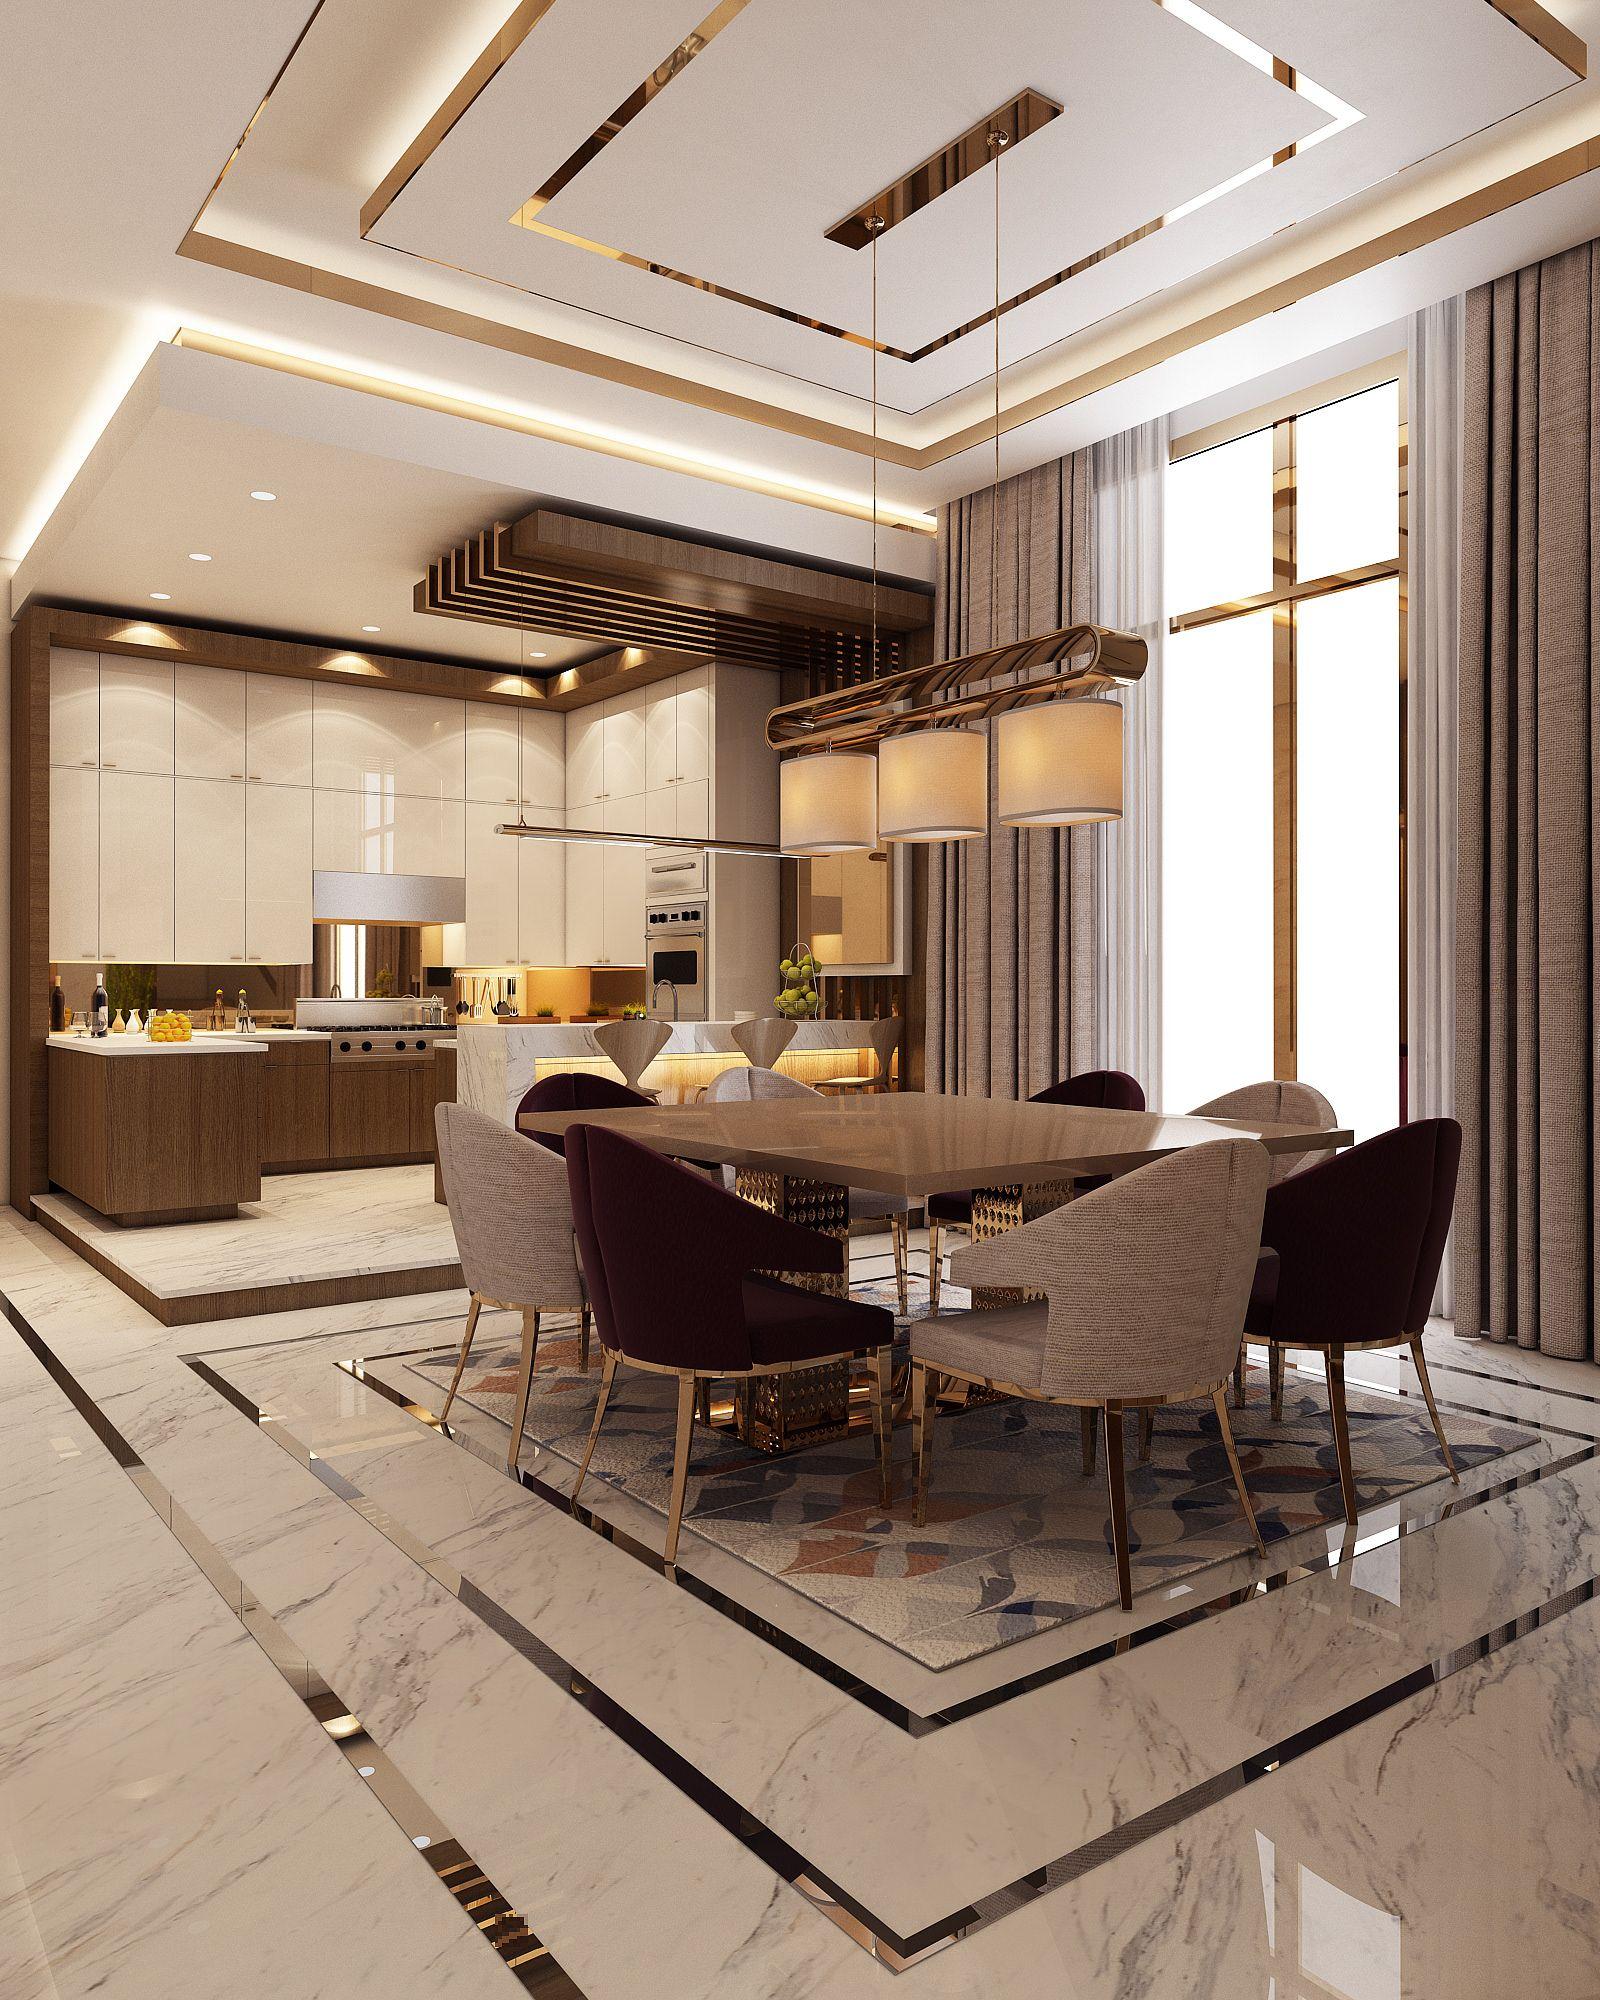 Luxury Modern Villa Qatar On Behance Luxury Dining Room